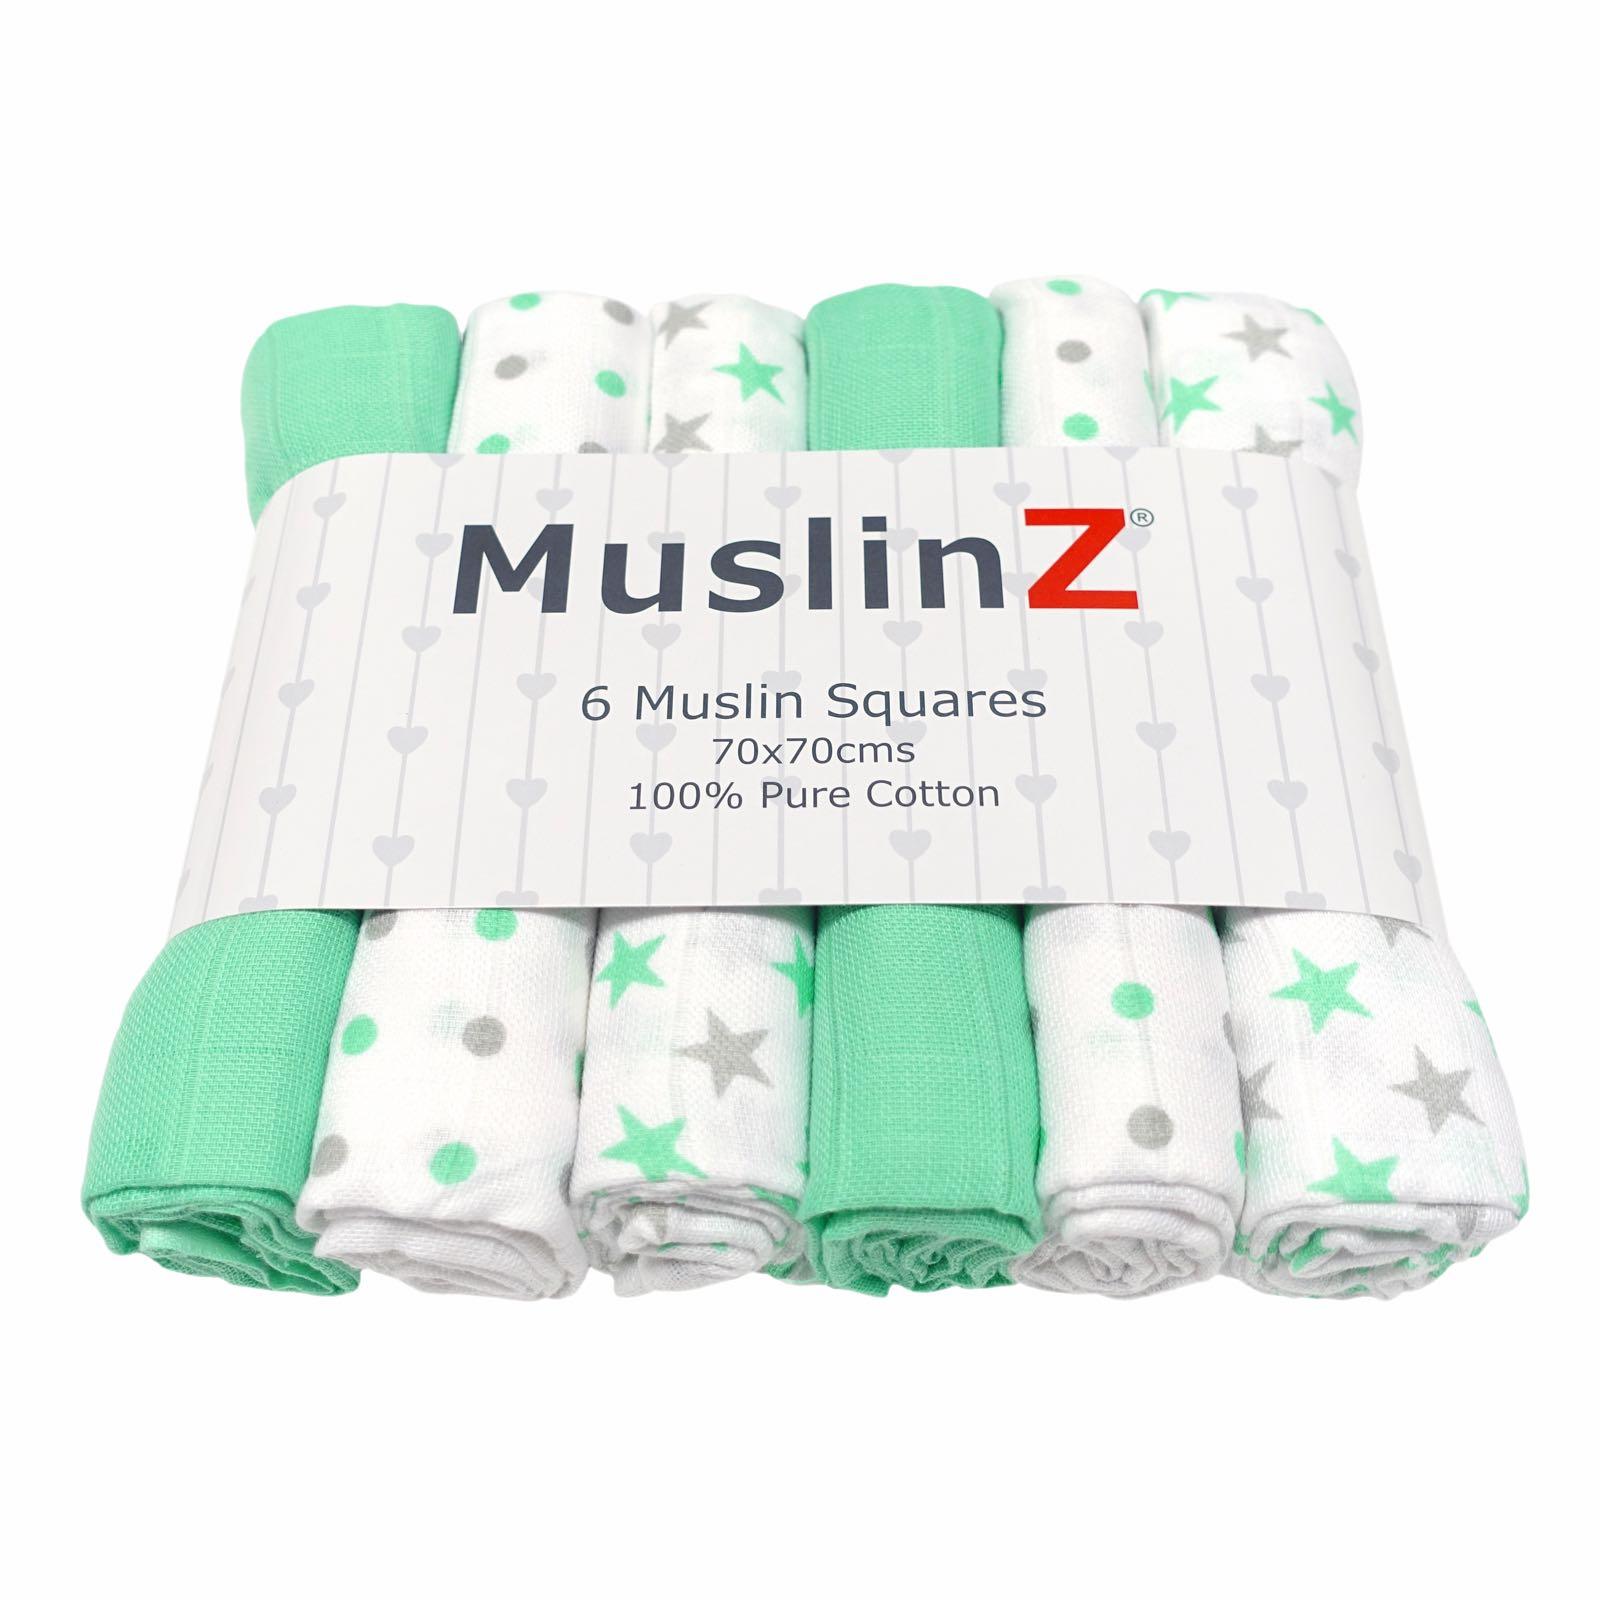 MuslinZ - 6 pack muslin squares - Mint Star combo